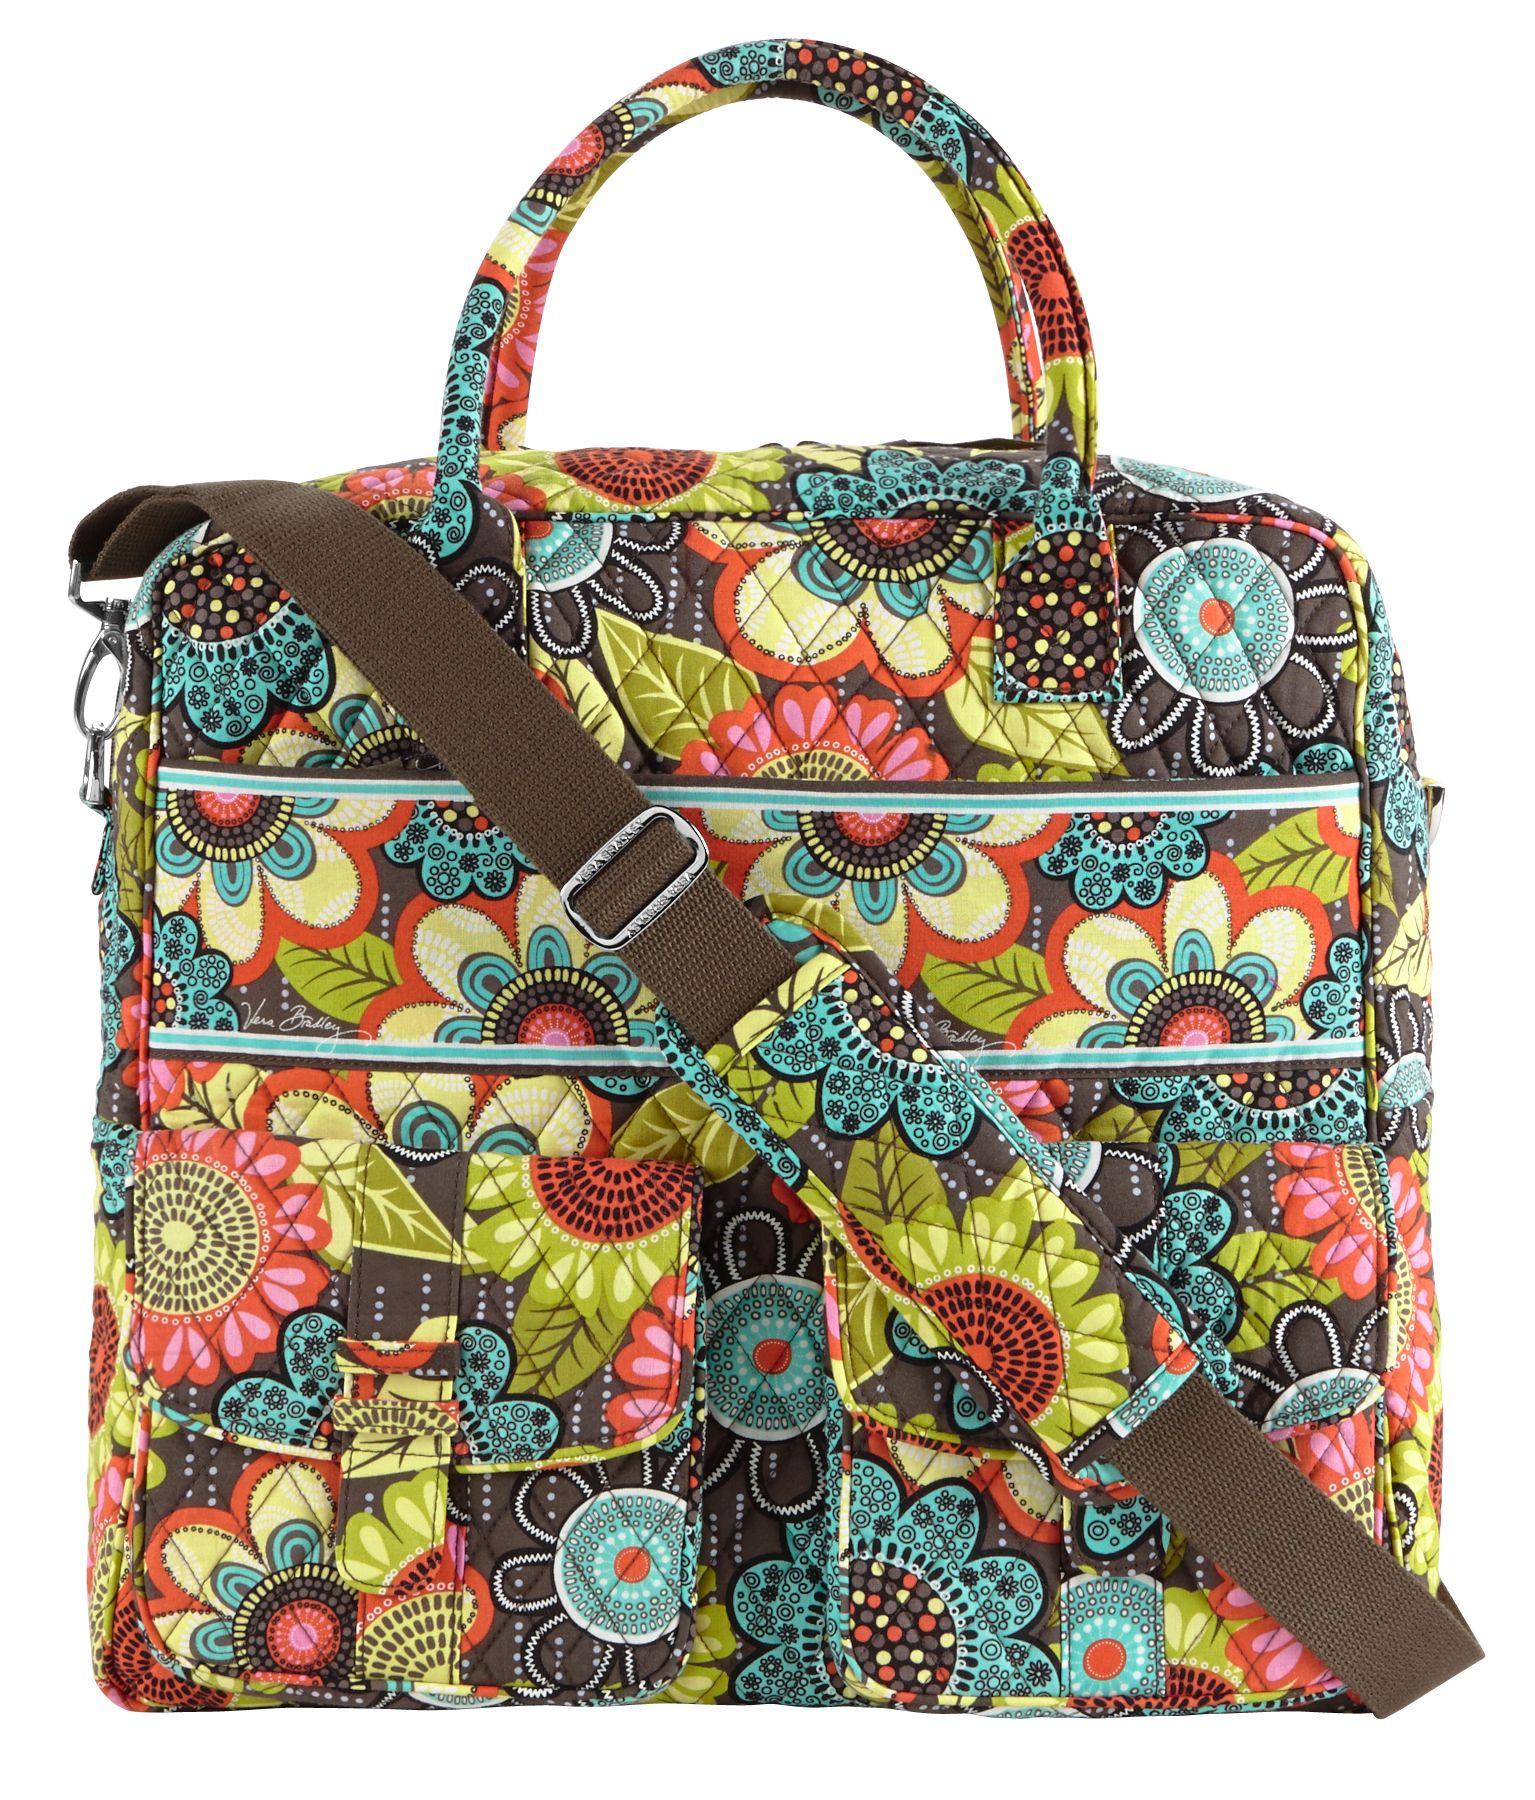 Vera bradley grand cargo bag in flower shower sale travel for Vera bradley bathroom bag